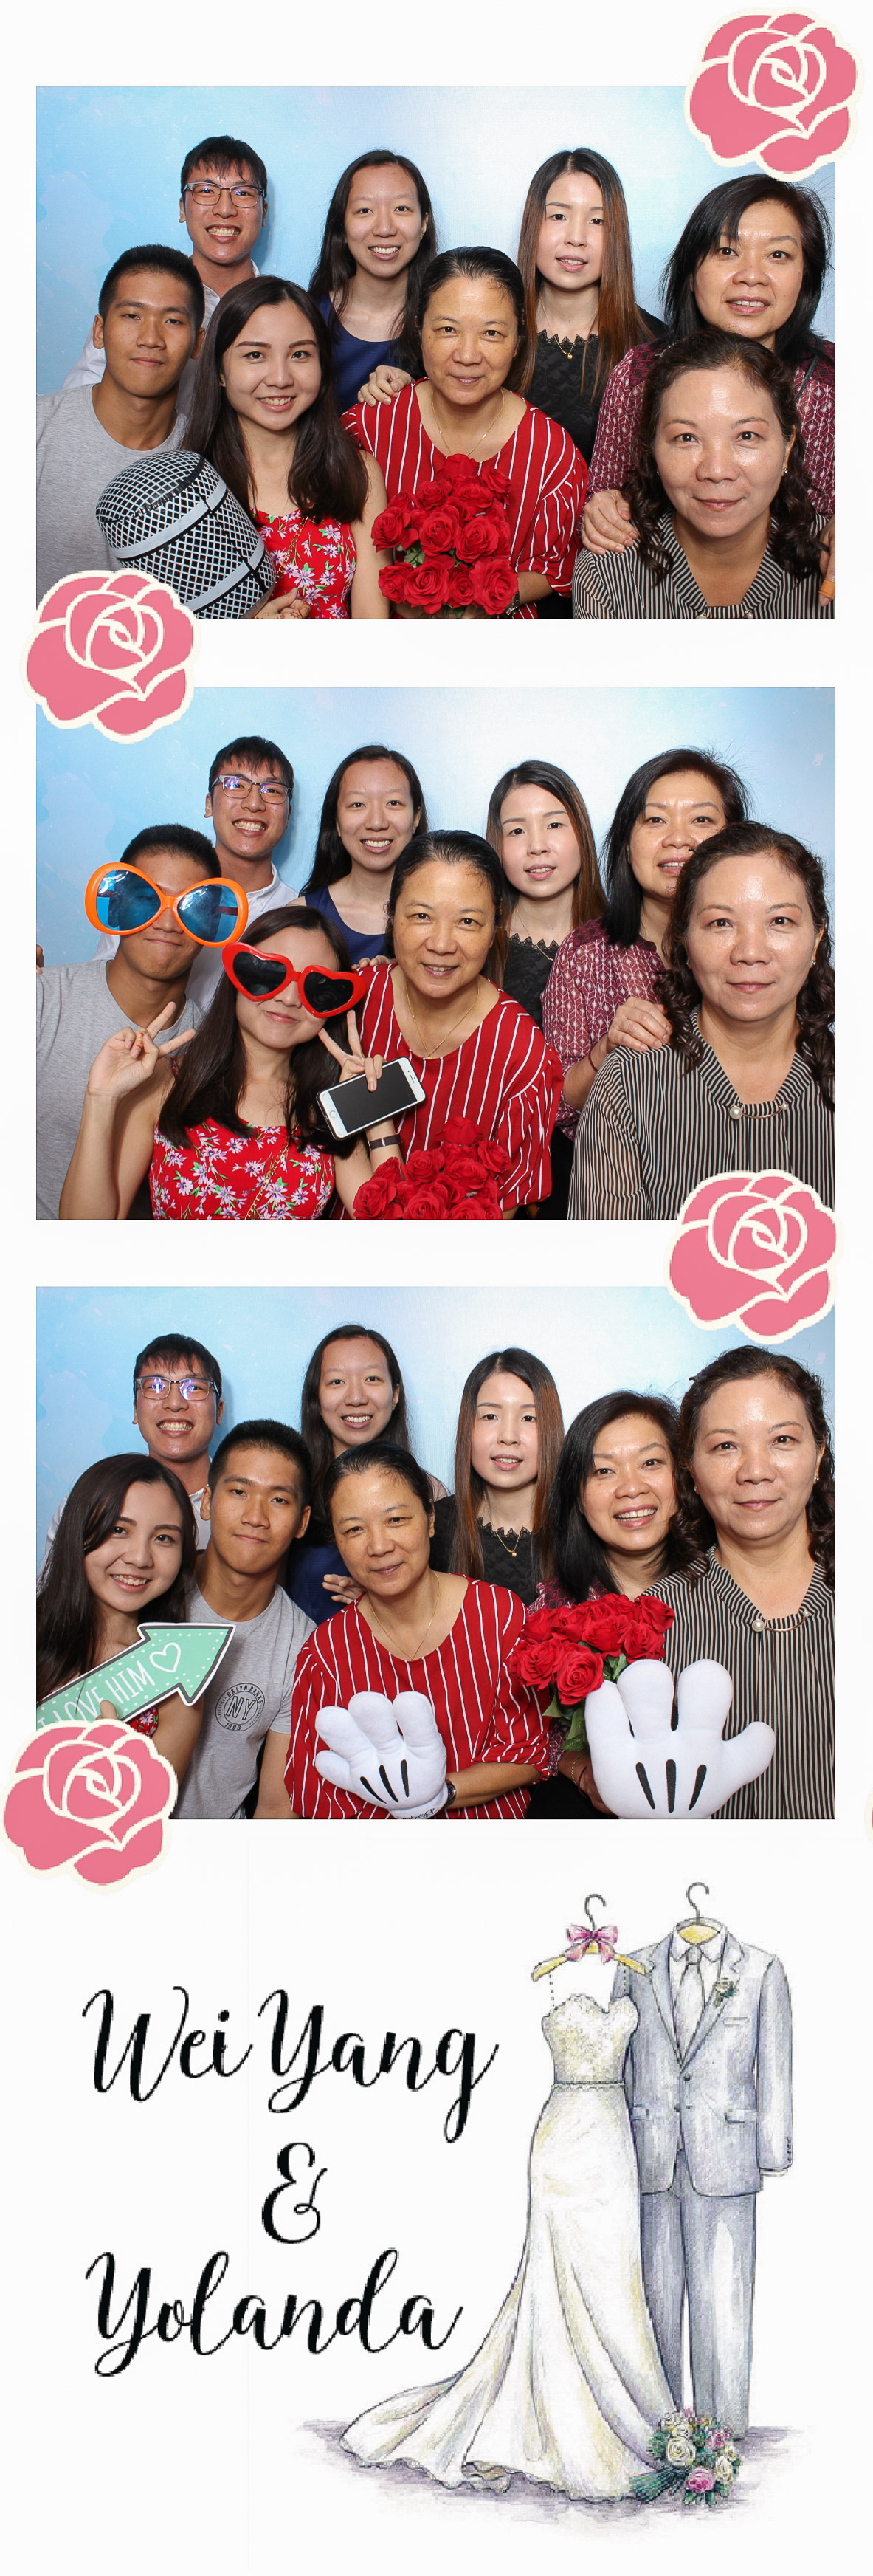 Photobooth 1706-36